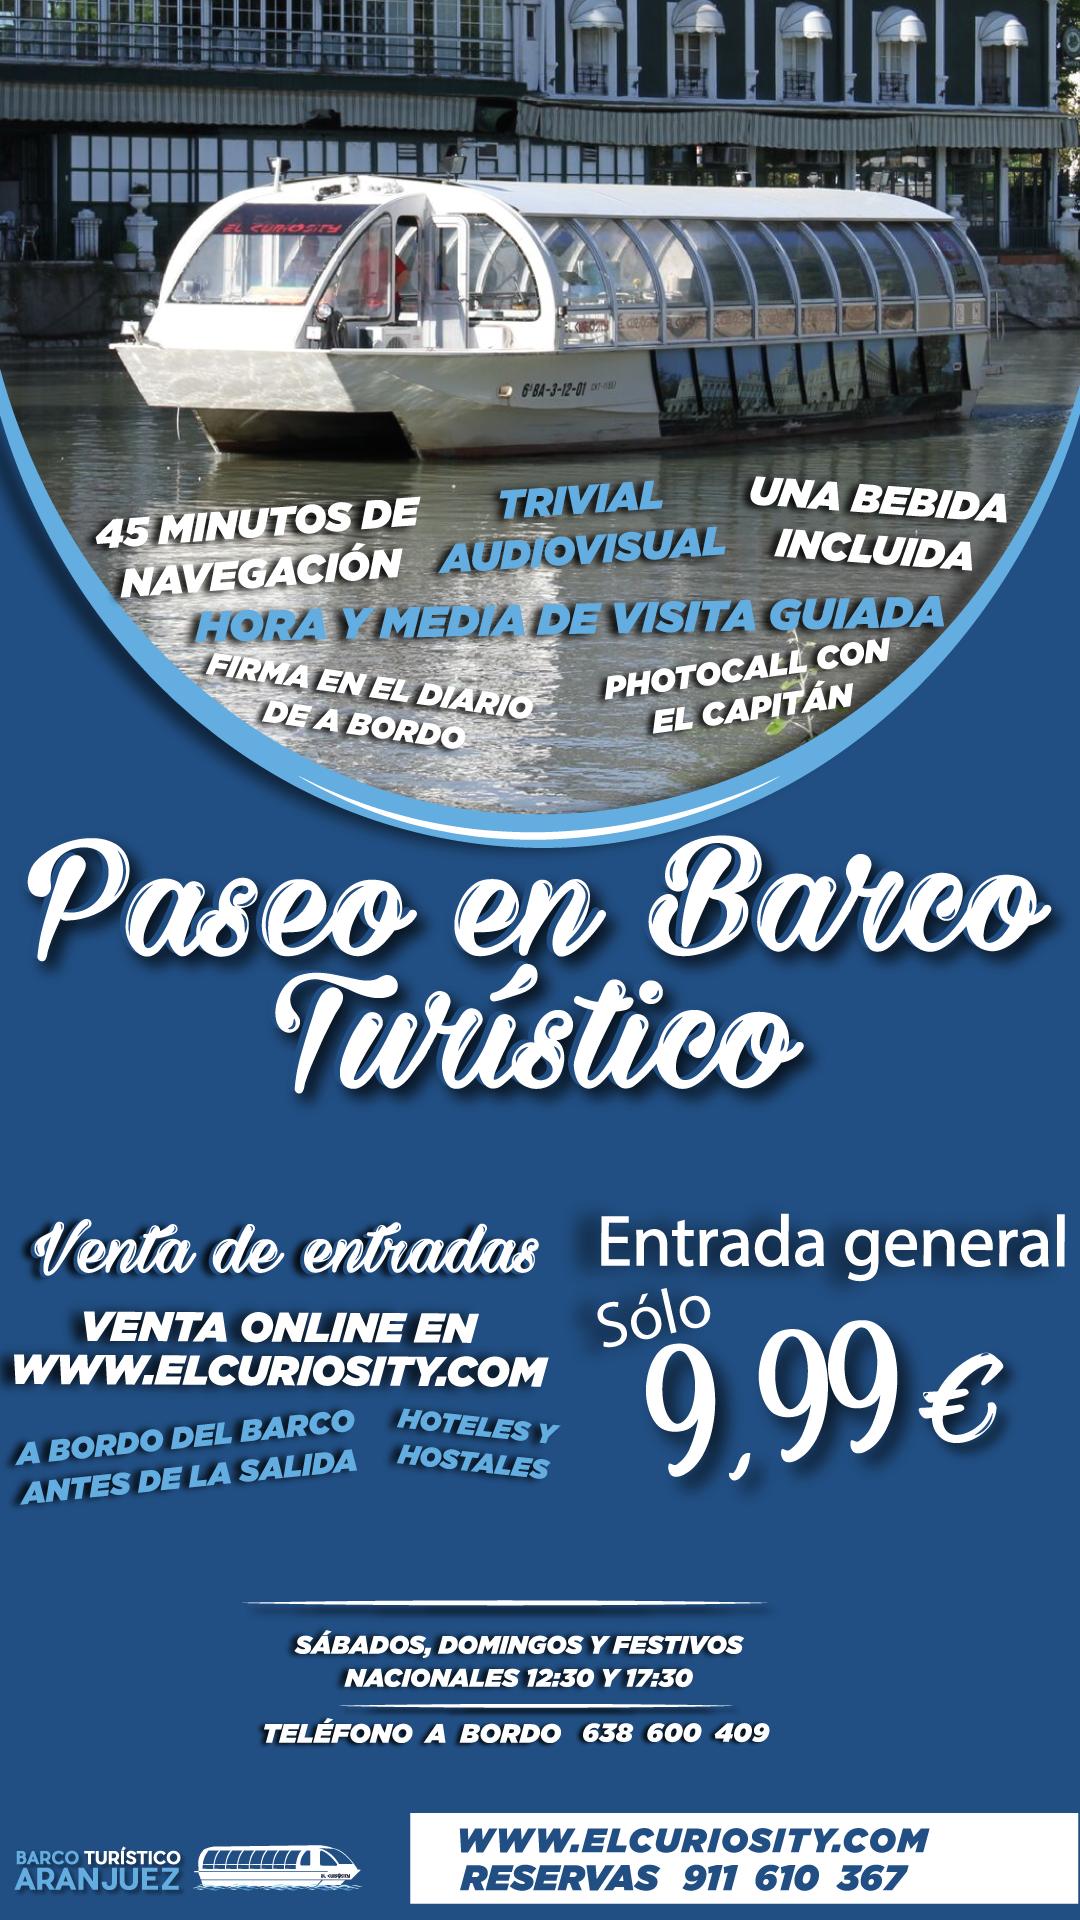 Barco Turístico de Aranjuez